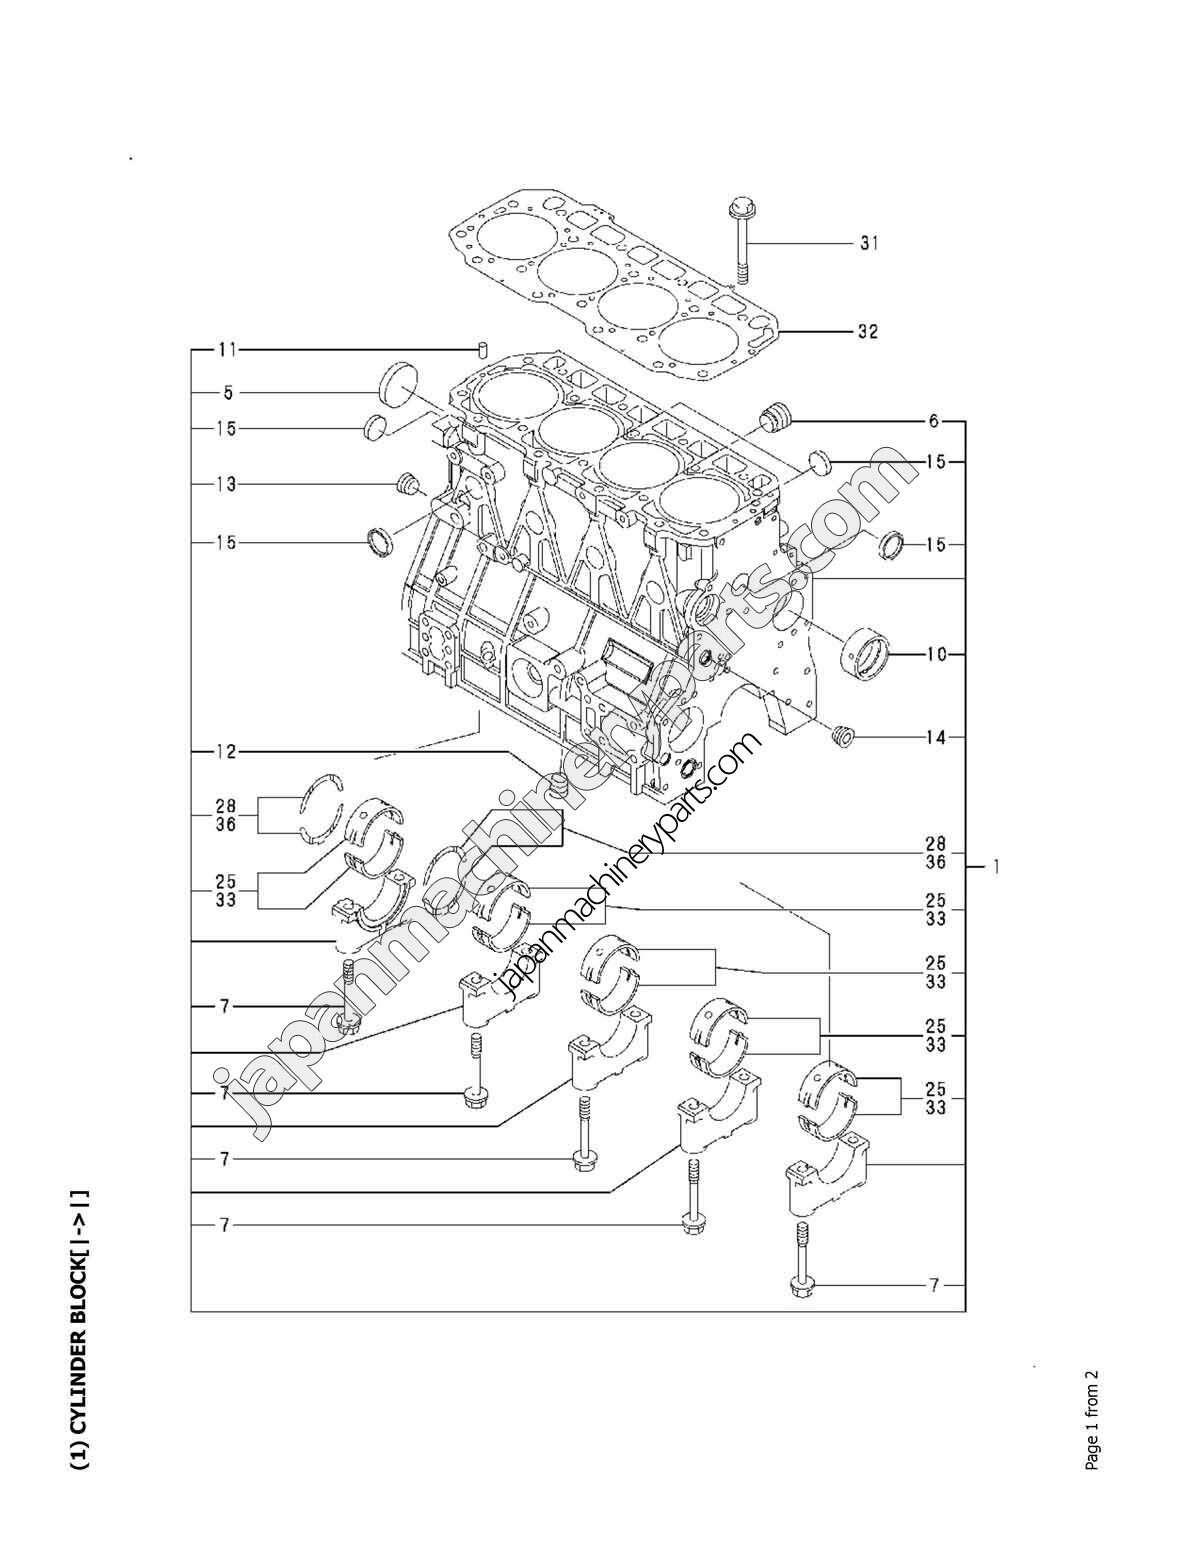 Yanmar Engine Diagram Schematics Wiring Diagrams Boat Harness Tractor L100 Marine Diesel